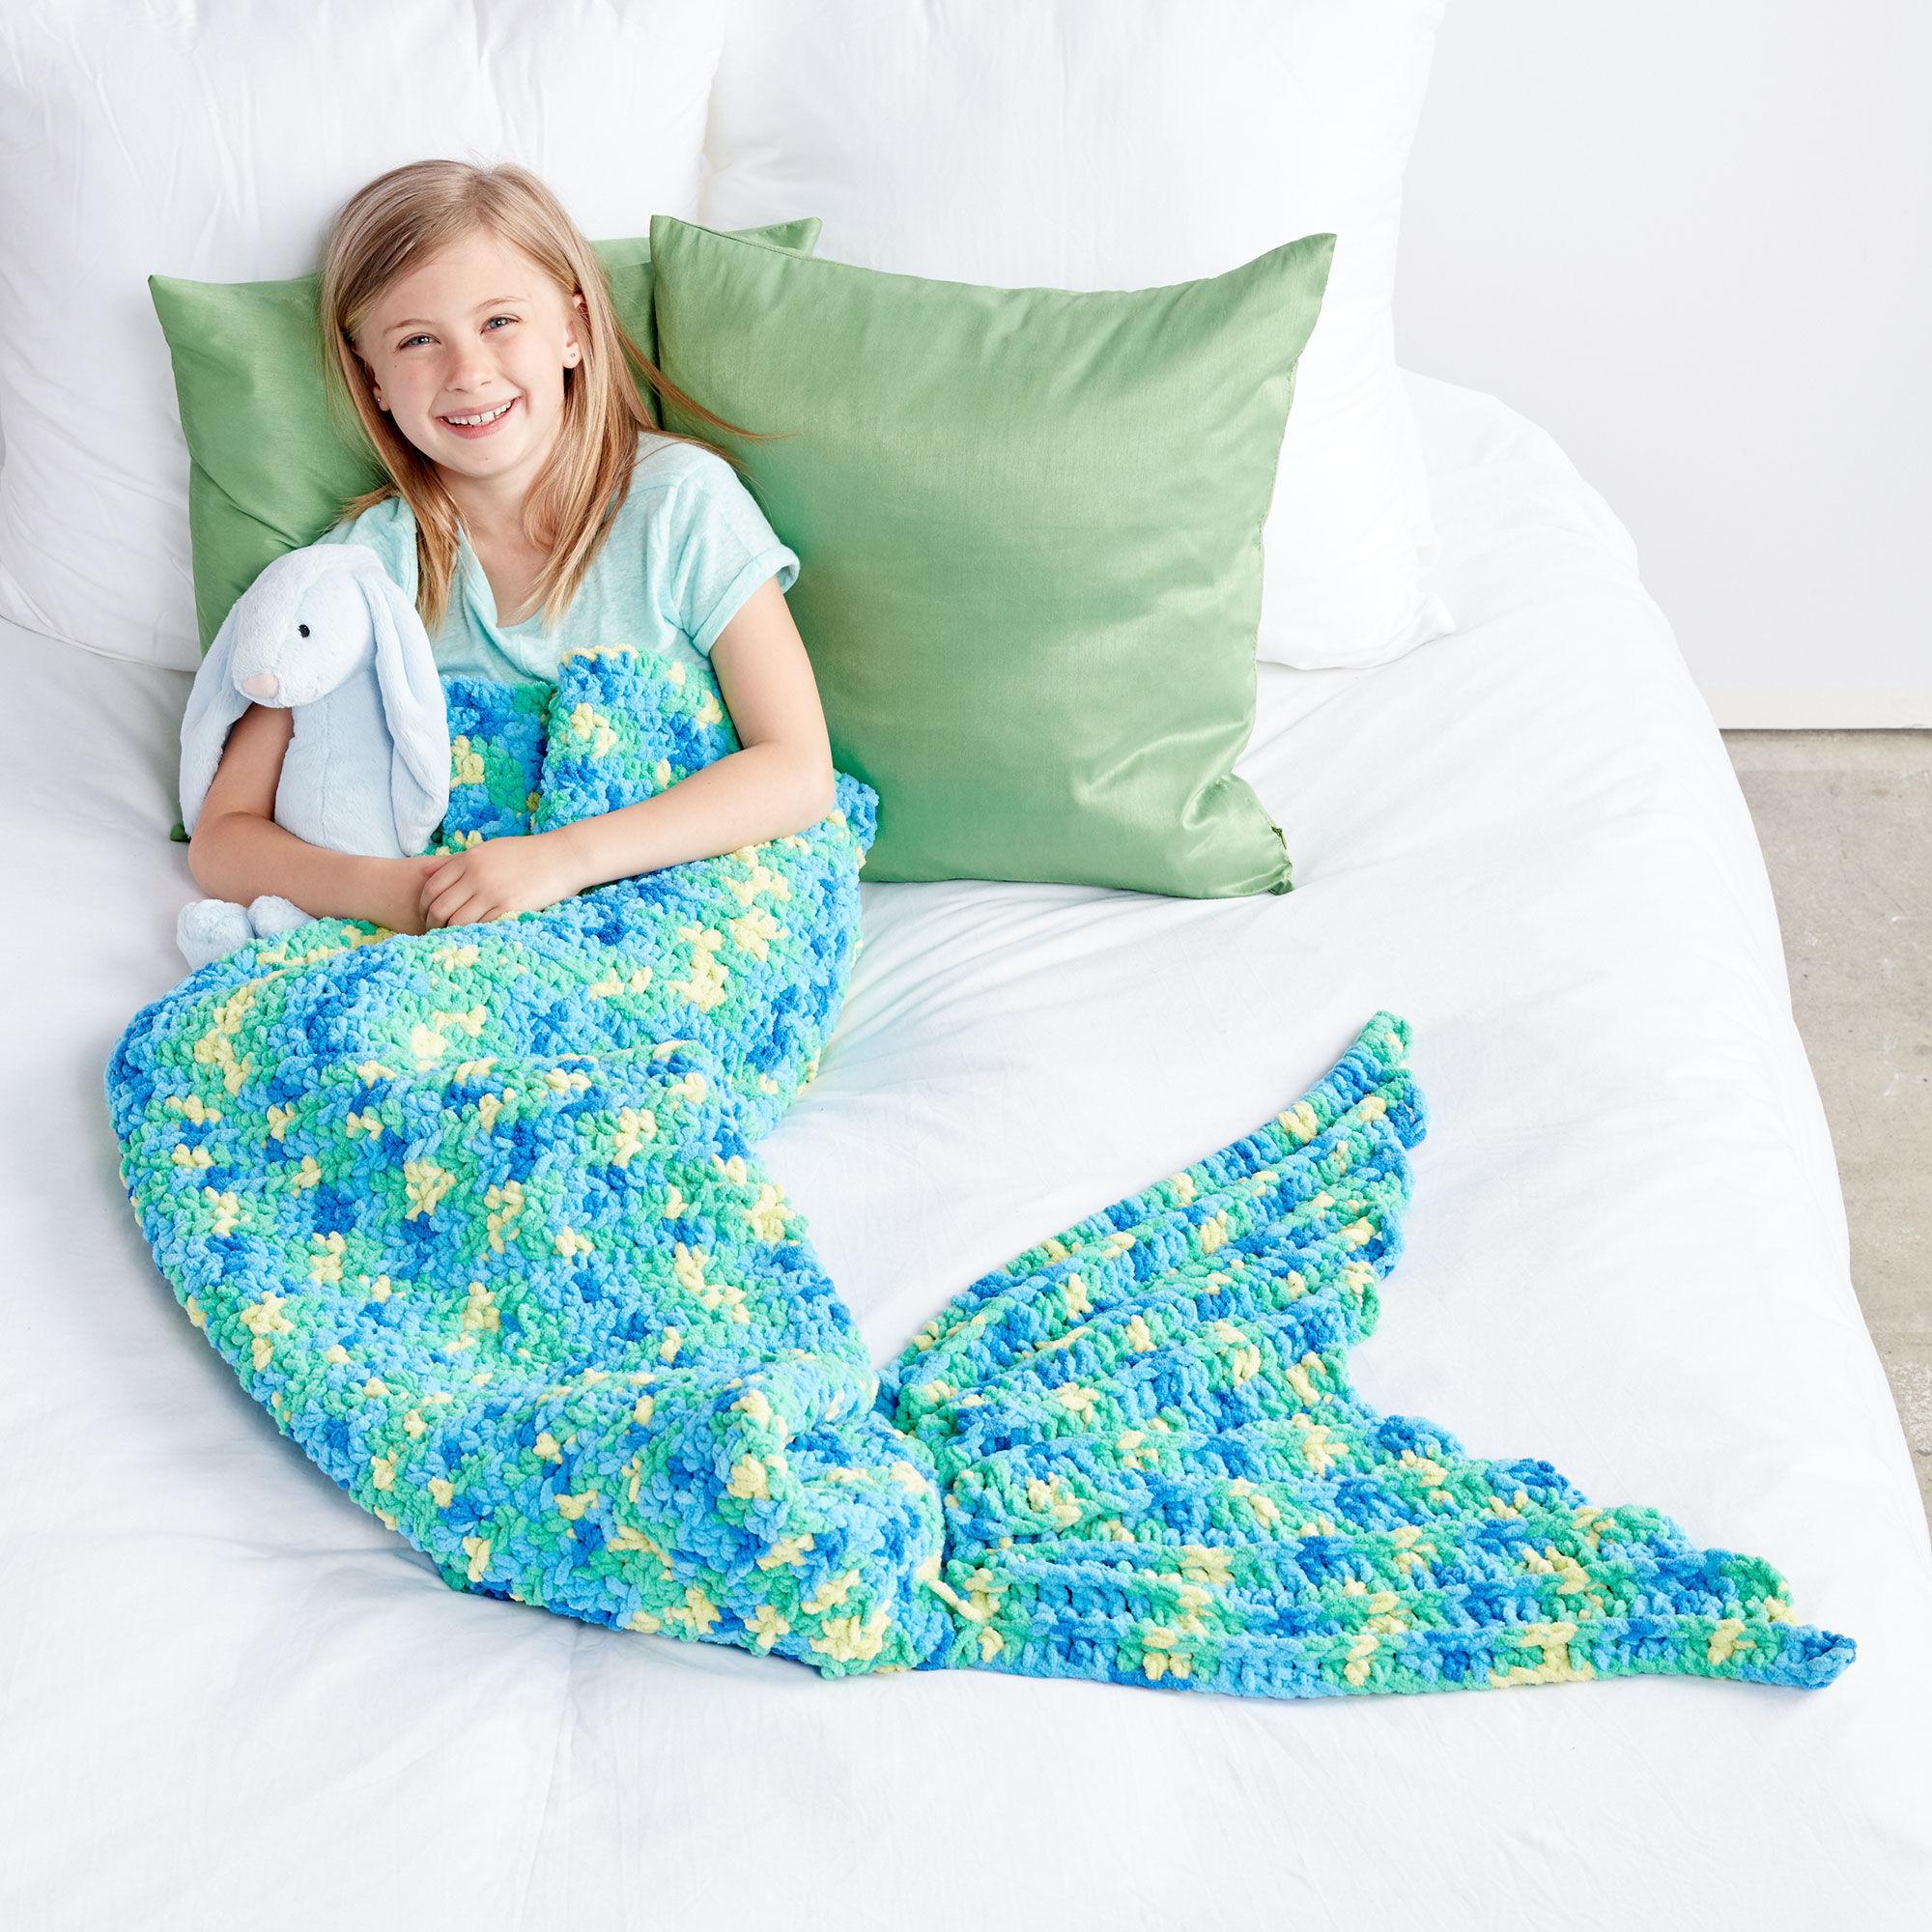 Groovy Bernat My Mermaid Crochet Snuggle Sack Blue Yarnspirations Machost Co Dining Chair Design Ideas Machostcouk